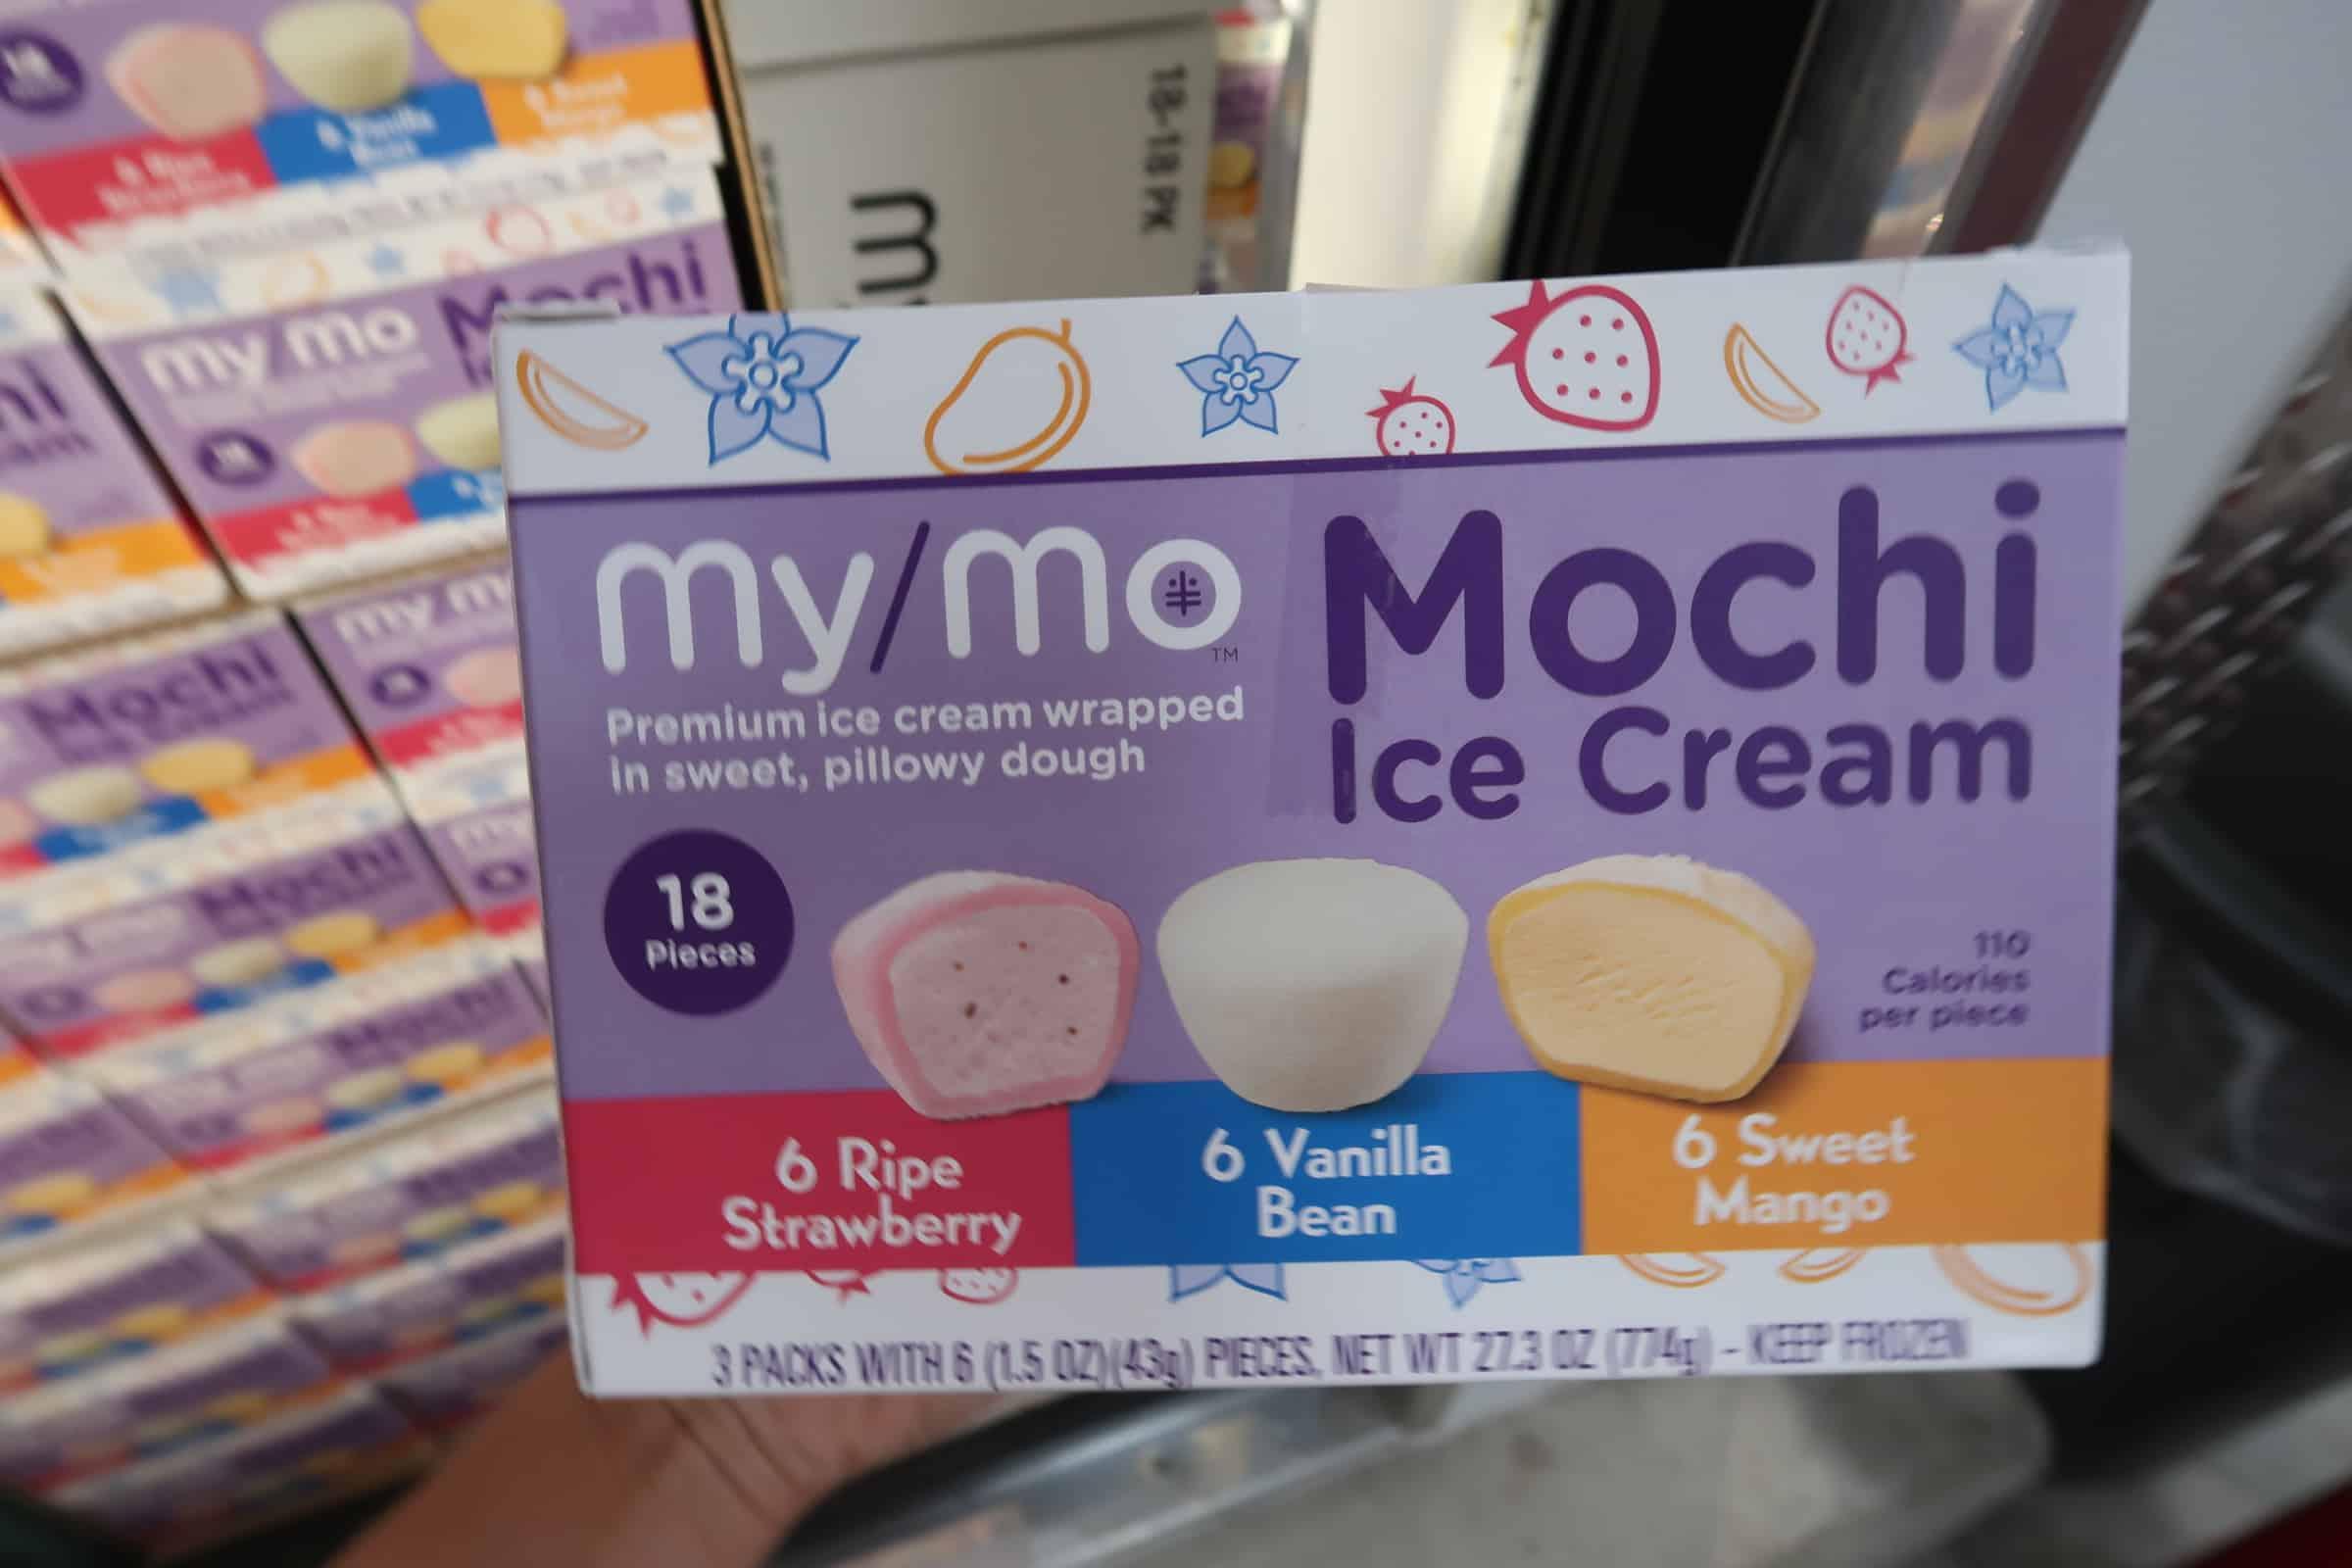 Save $3 on My Mo Mochi Ice Cream at Costco